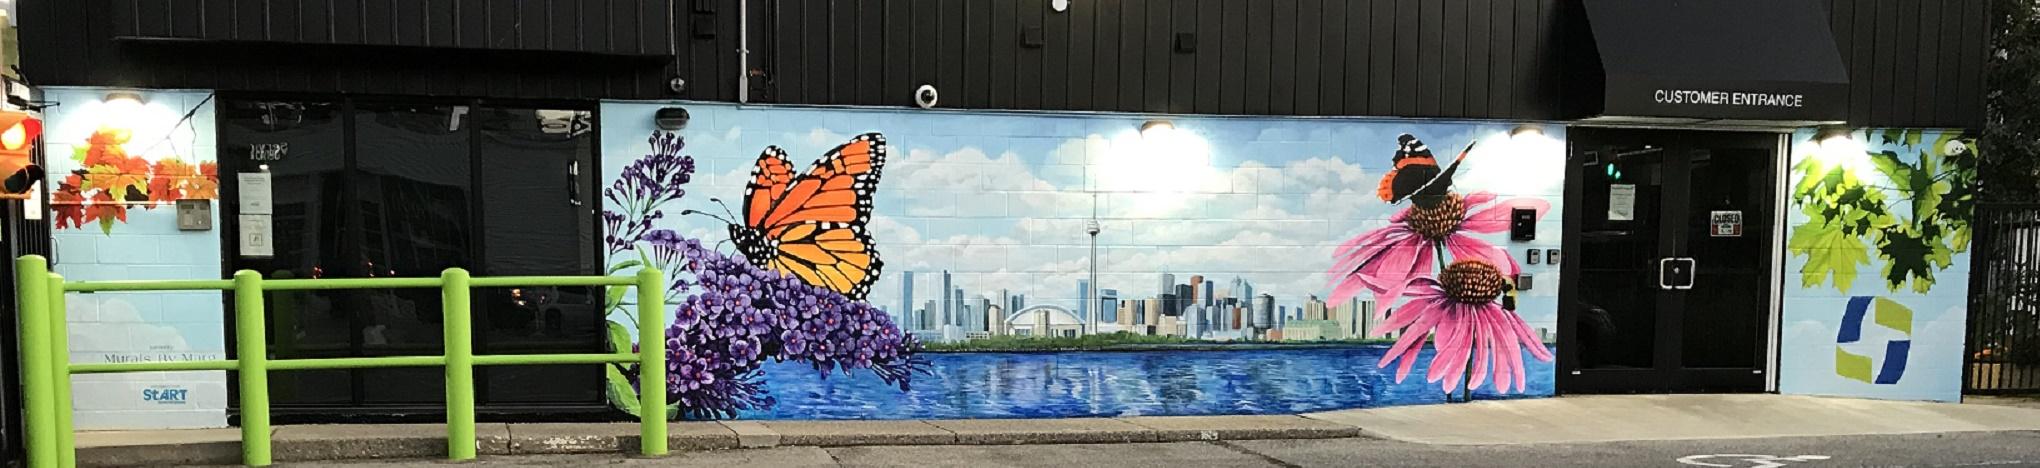 Murals By Marg Green Storage 2